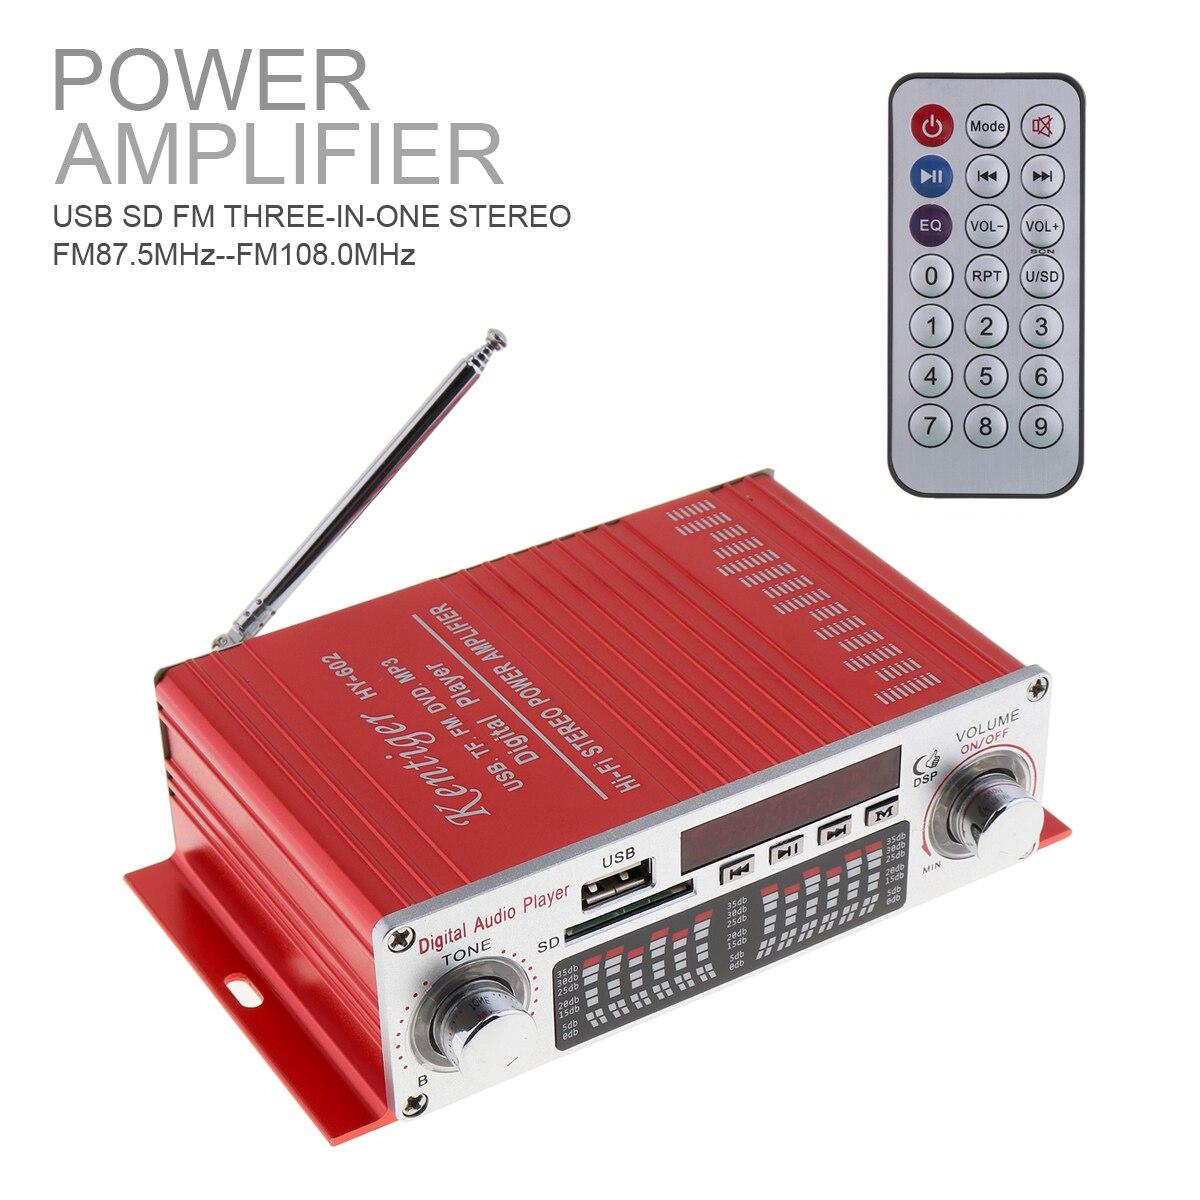 HY-602 HI-FI Digital Audio Player Car Amplifier FM Radio Stereo Player SD USB DVD MP3 Input with Remote Control FM Radio Receive